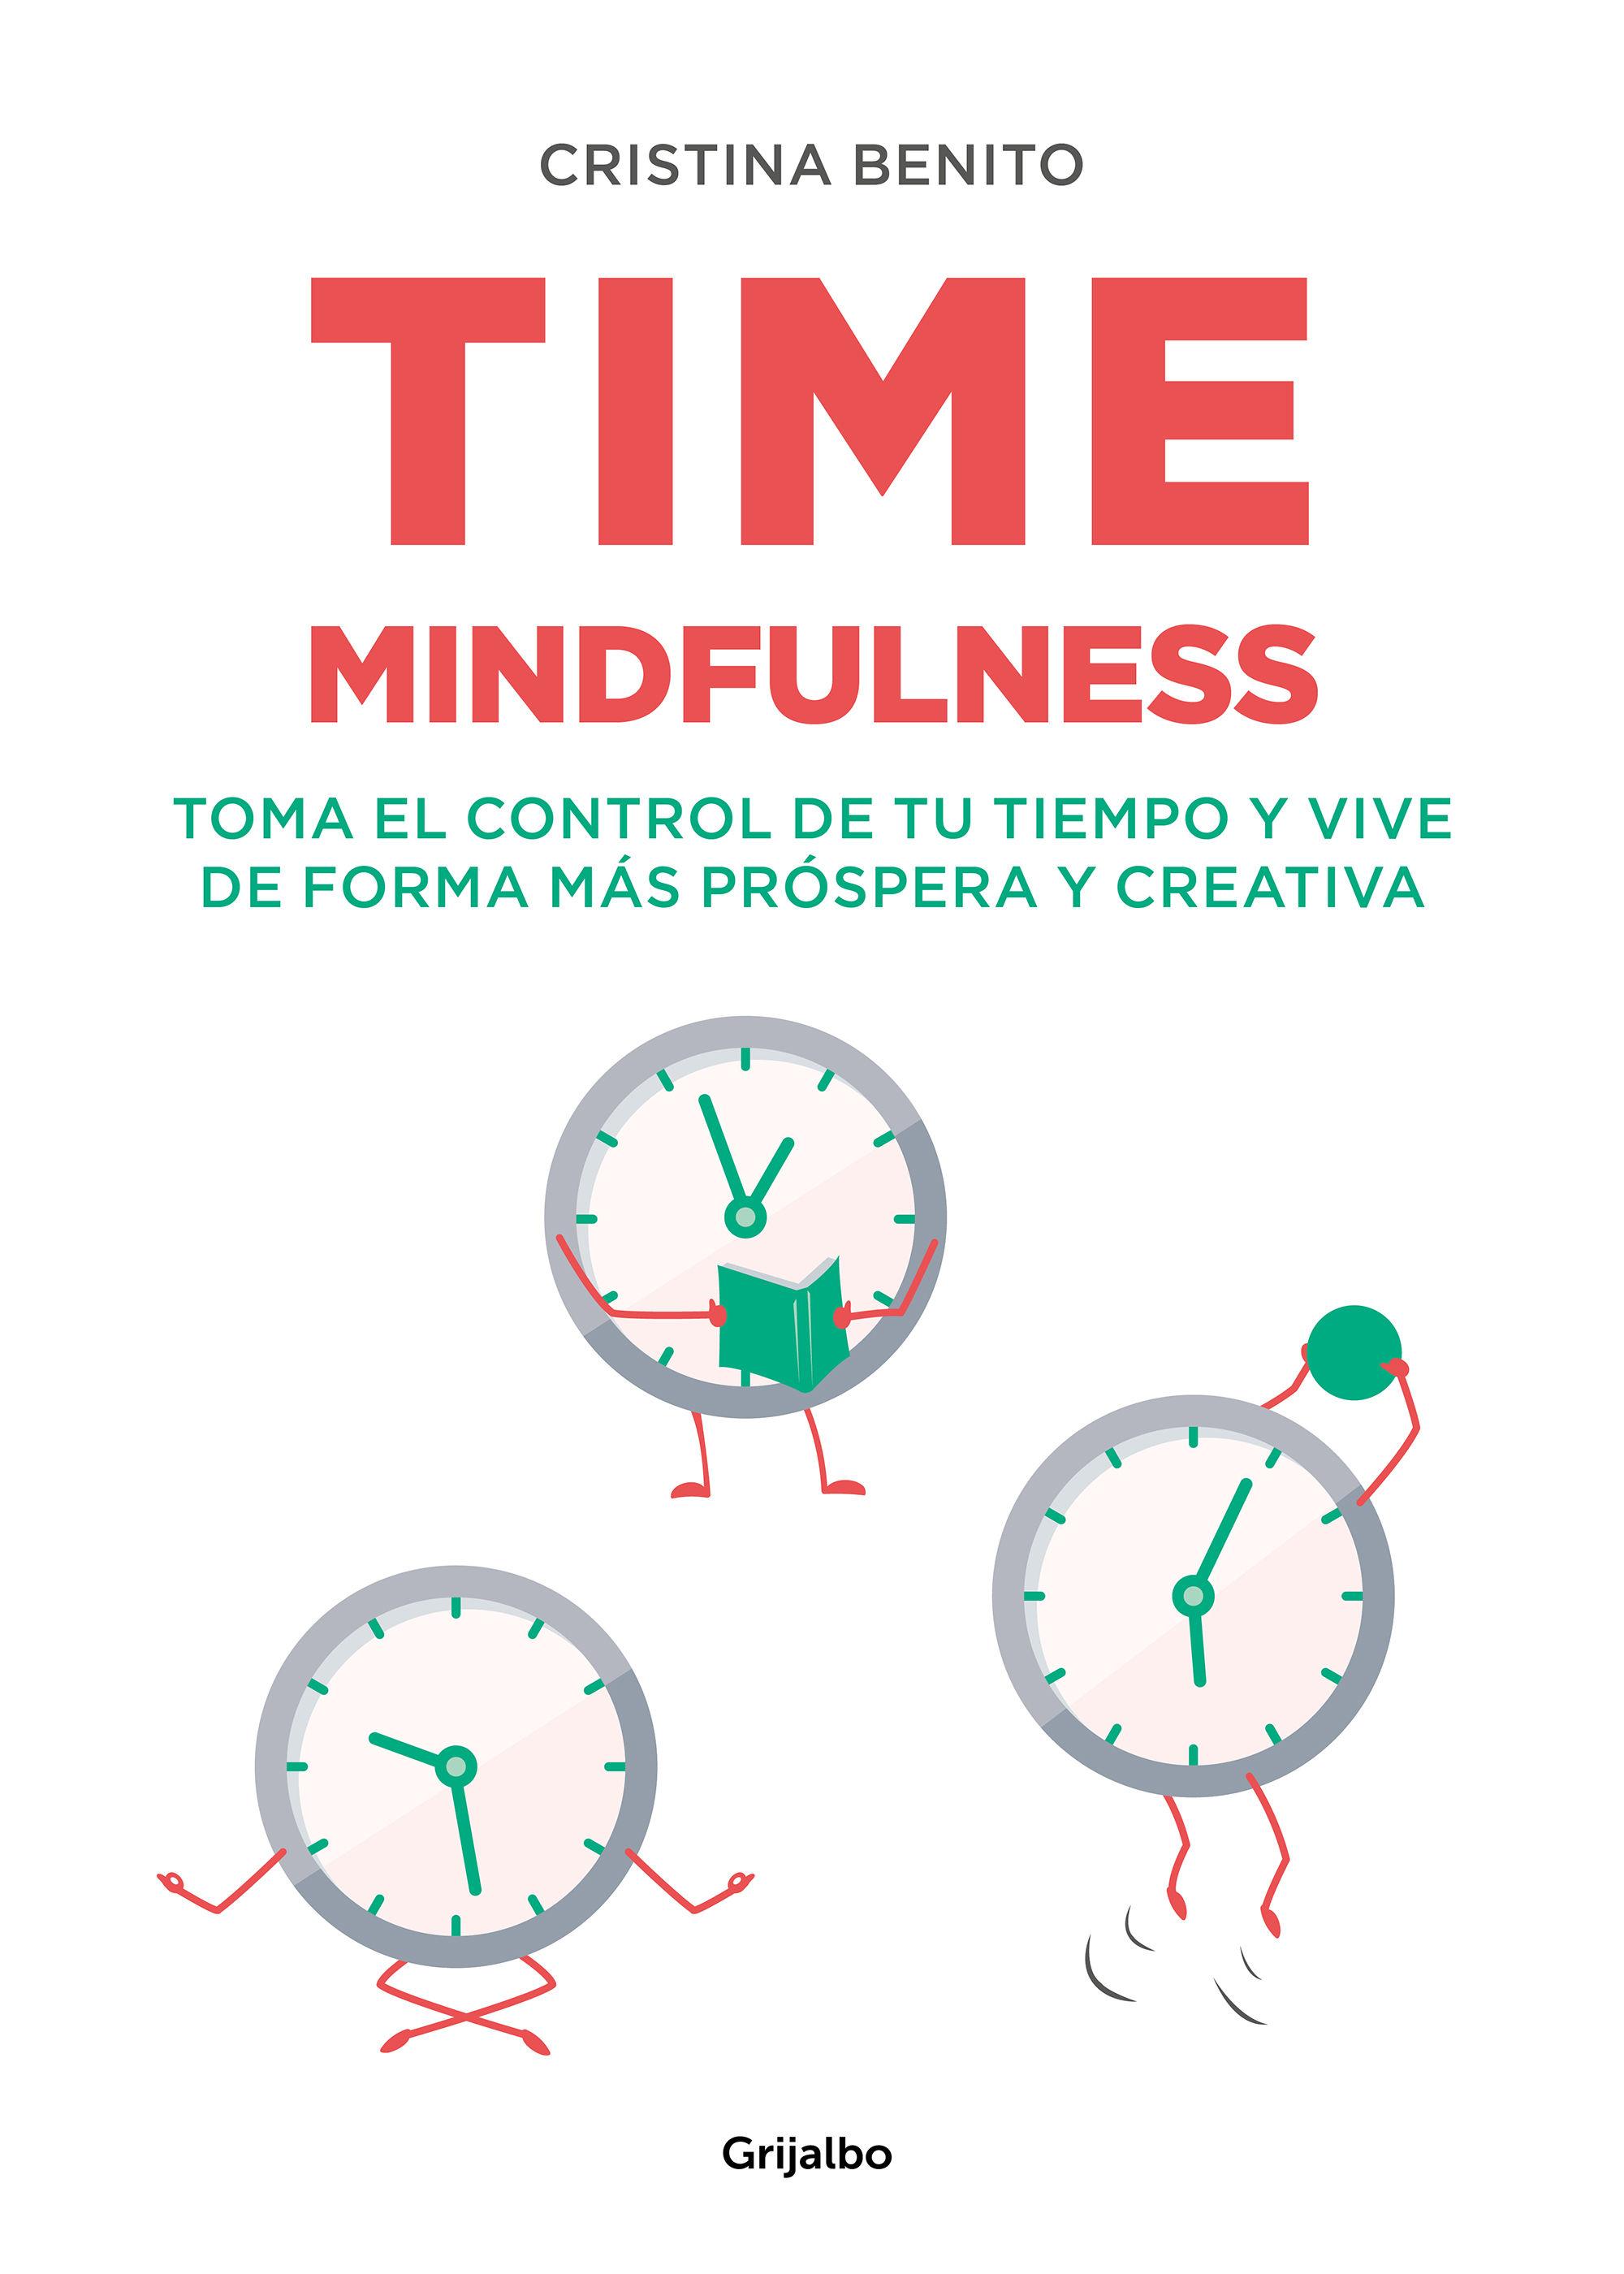 TIME MINDFULNESS